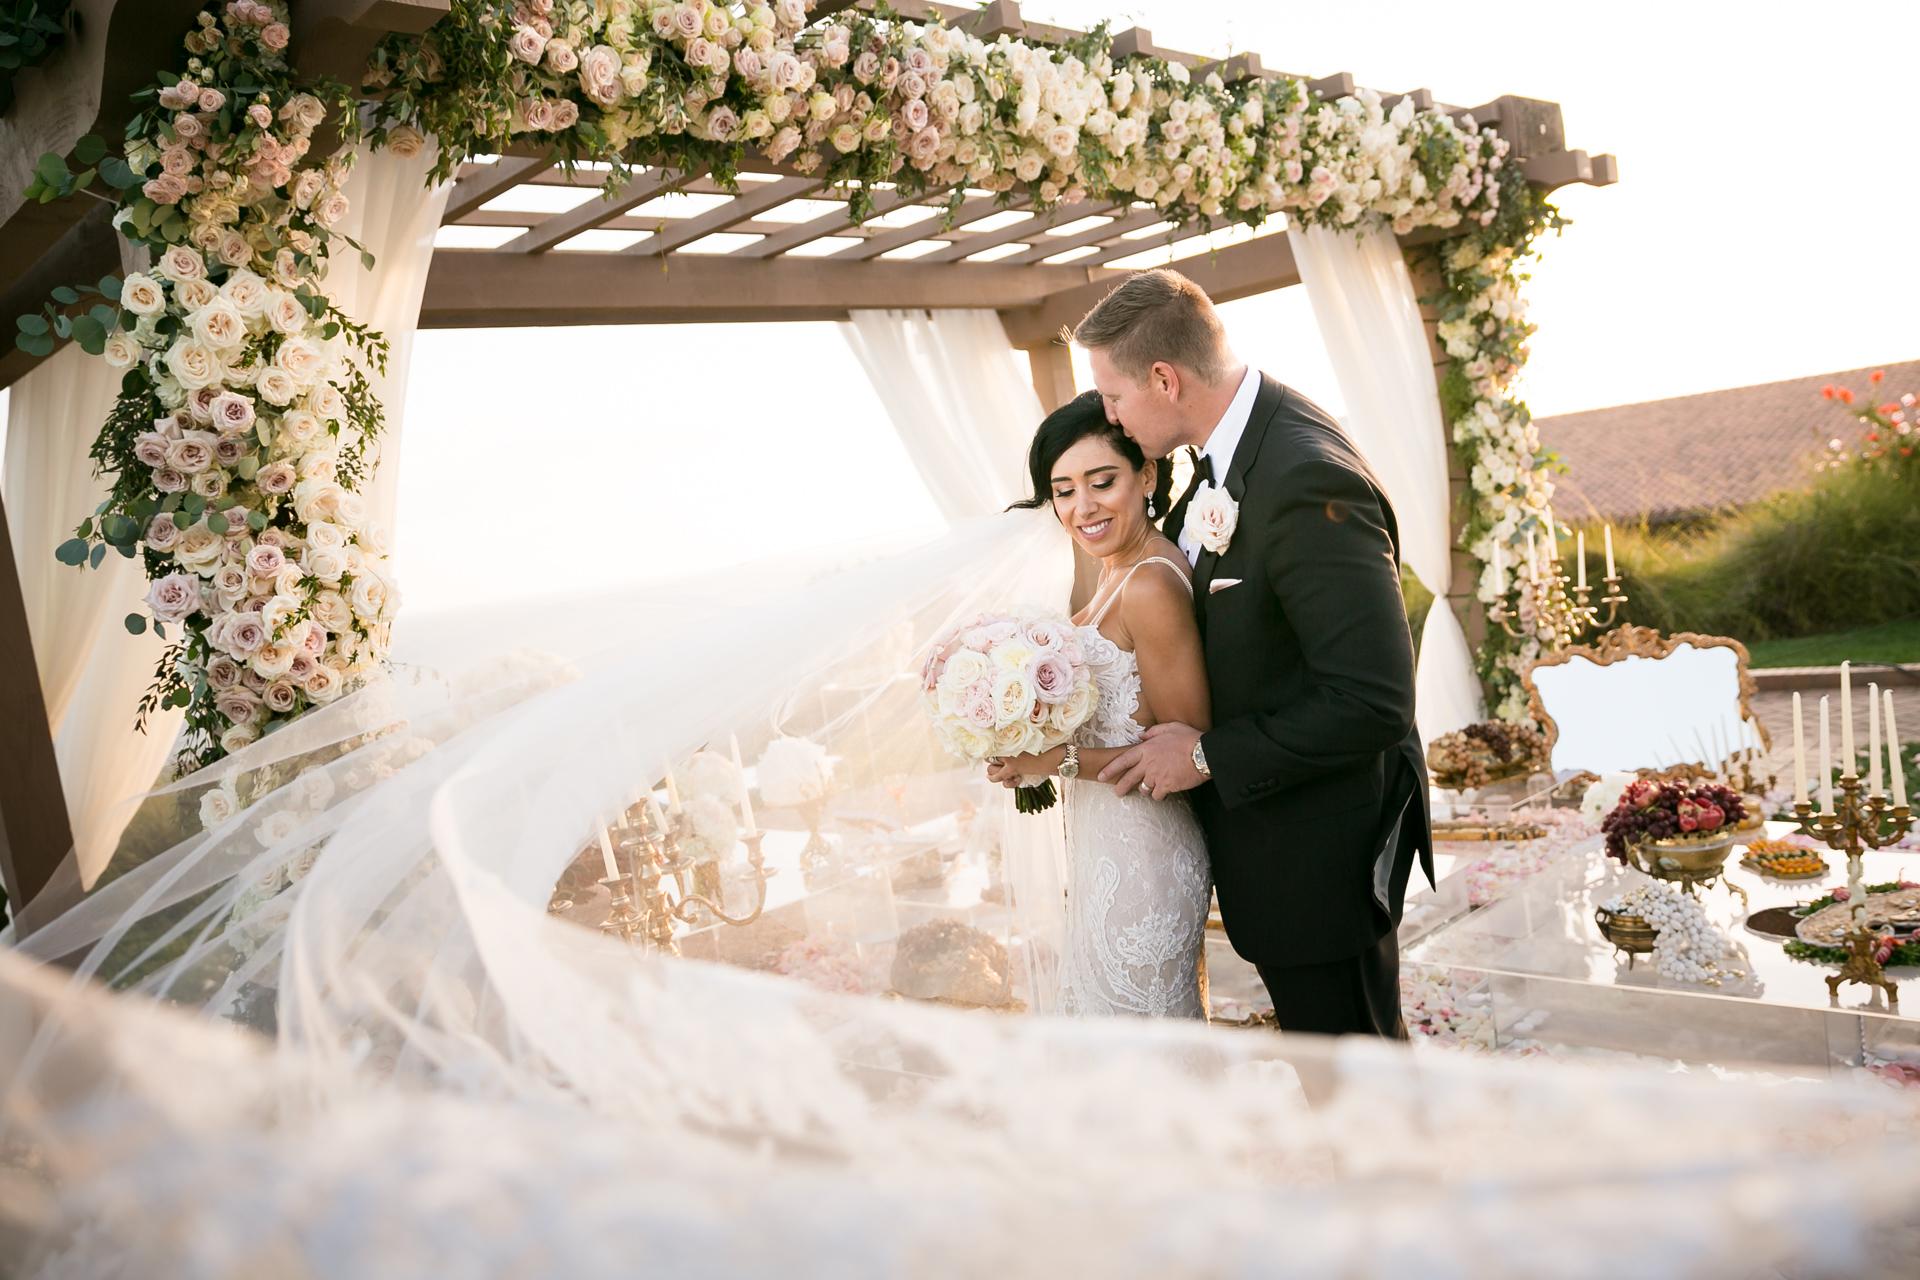 Wedding Photography Howto: Terranea Resort Persian Wedding